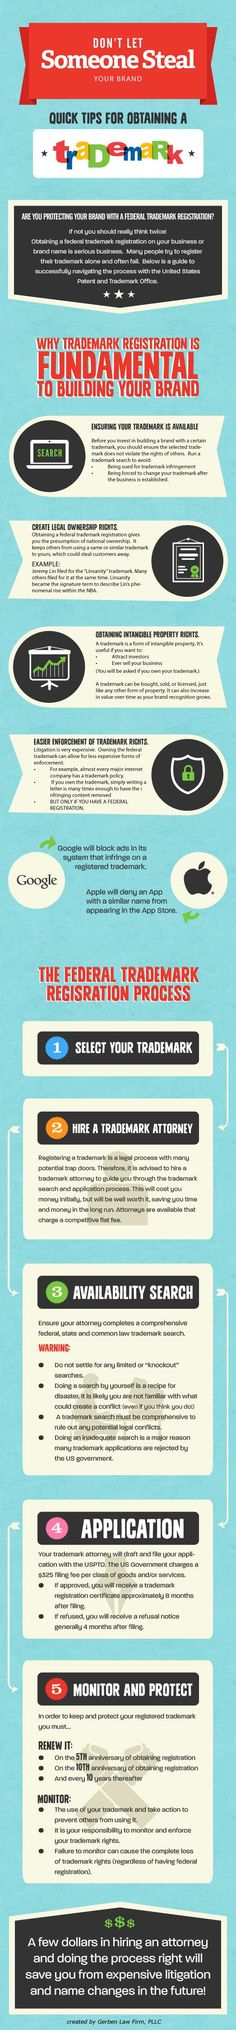 Register Trademark And Copyright Symbols Trademark Stuff